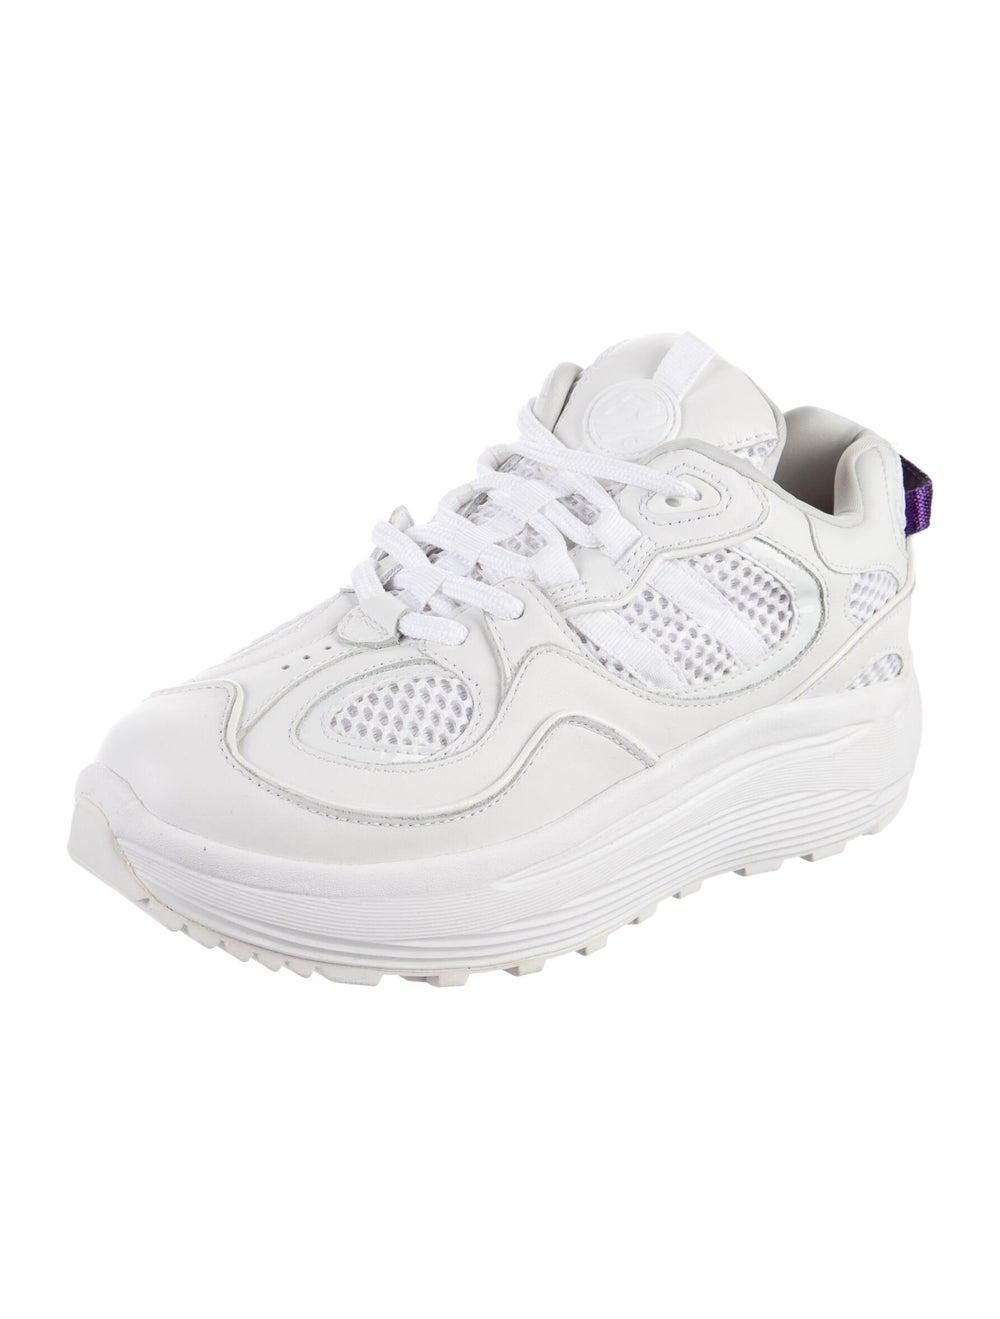 Eytys Snow Sneakers White - image 2